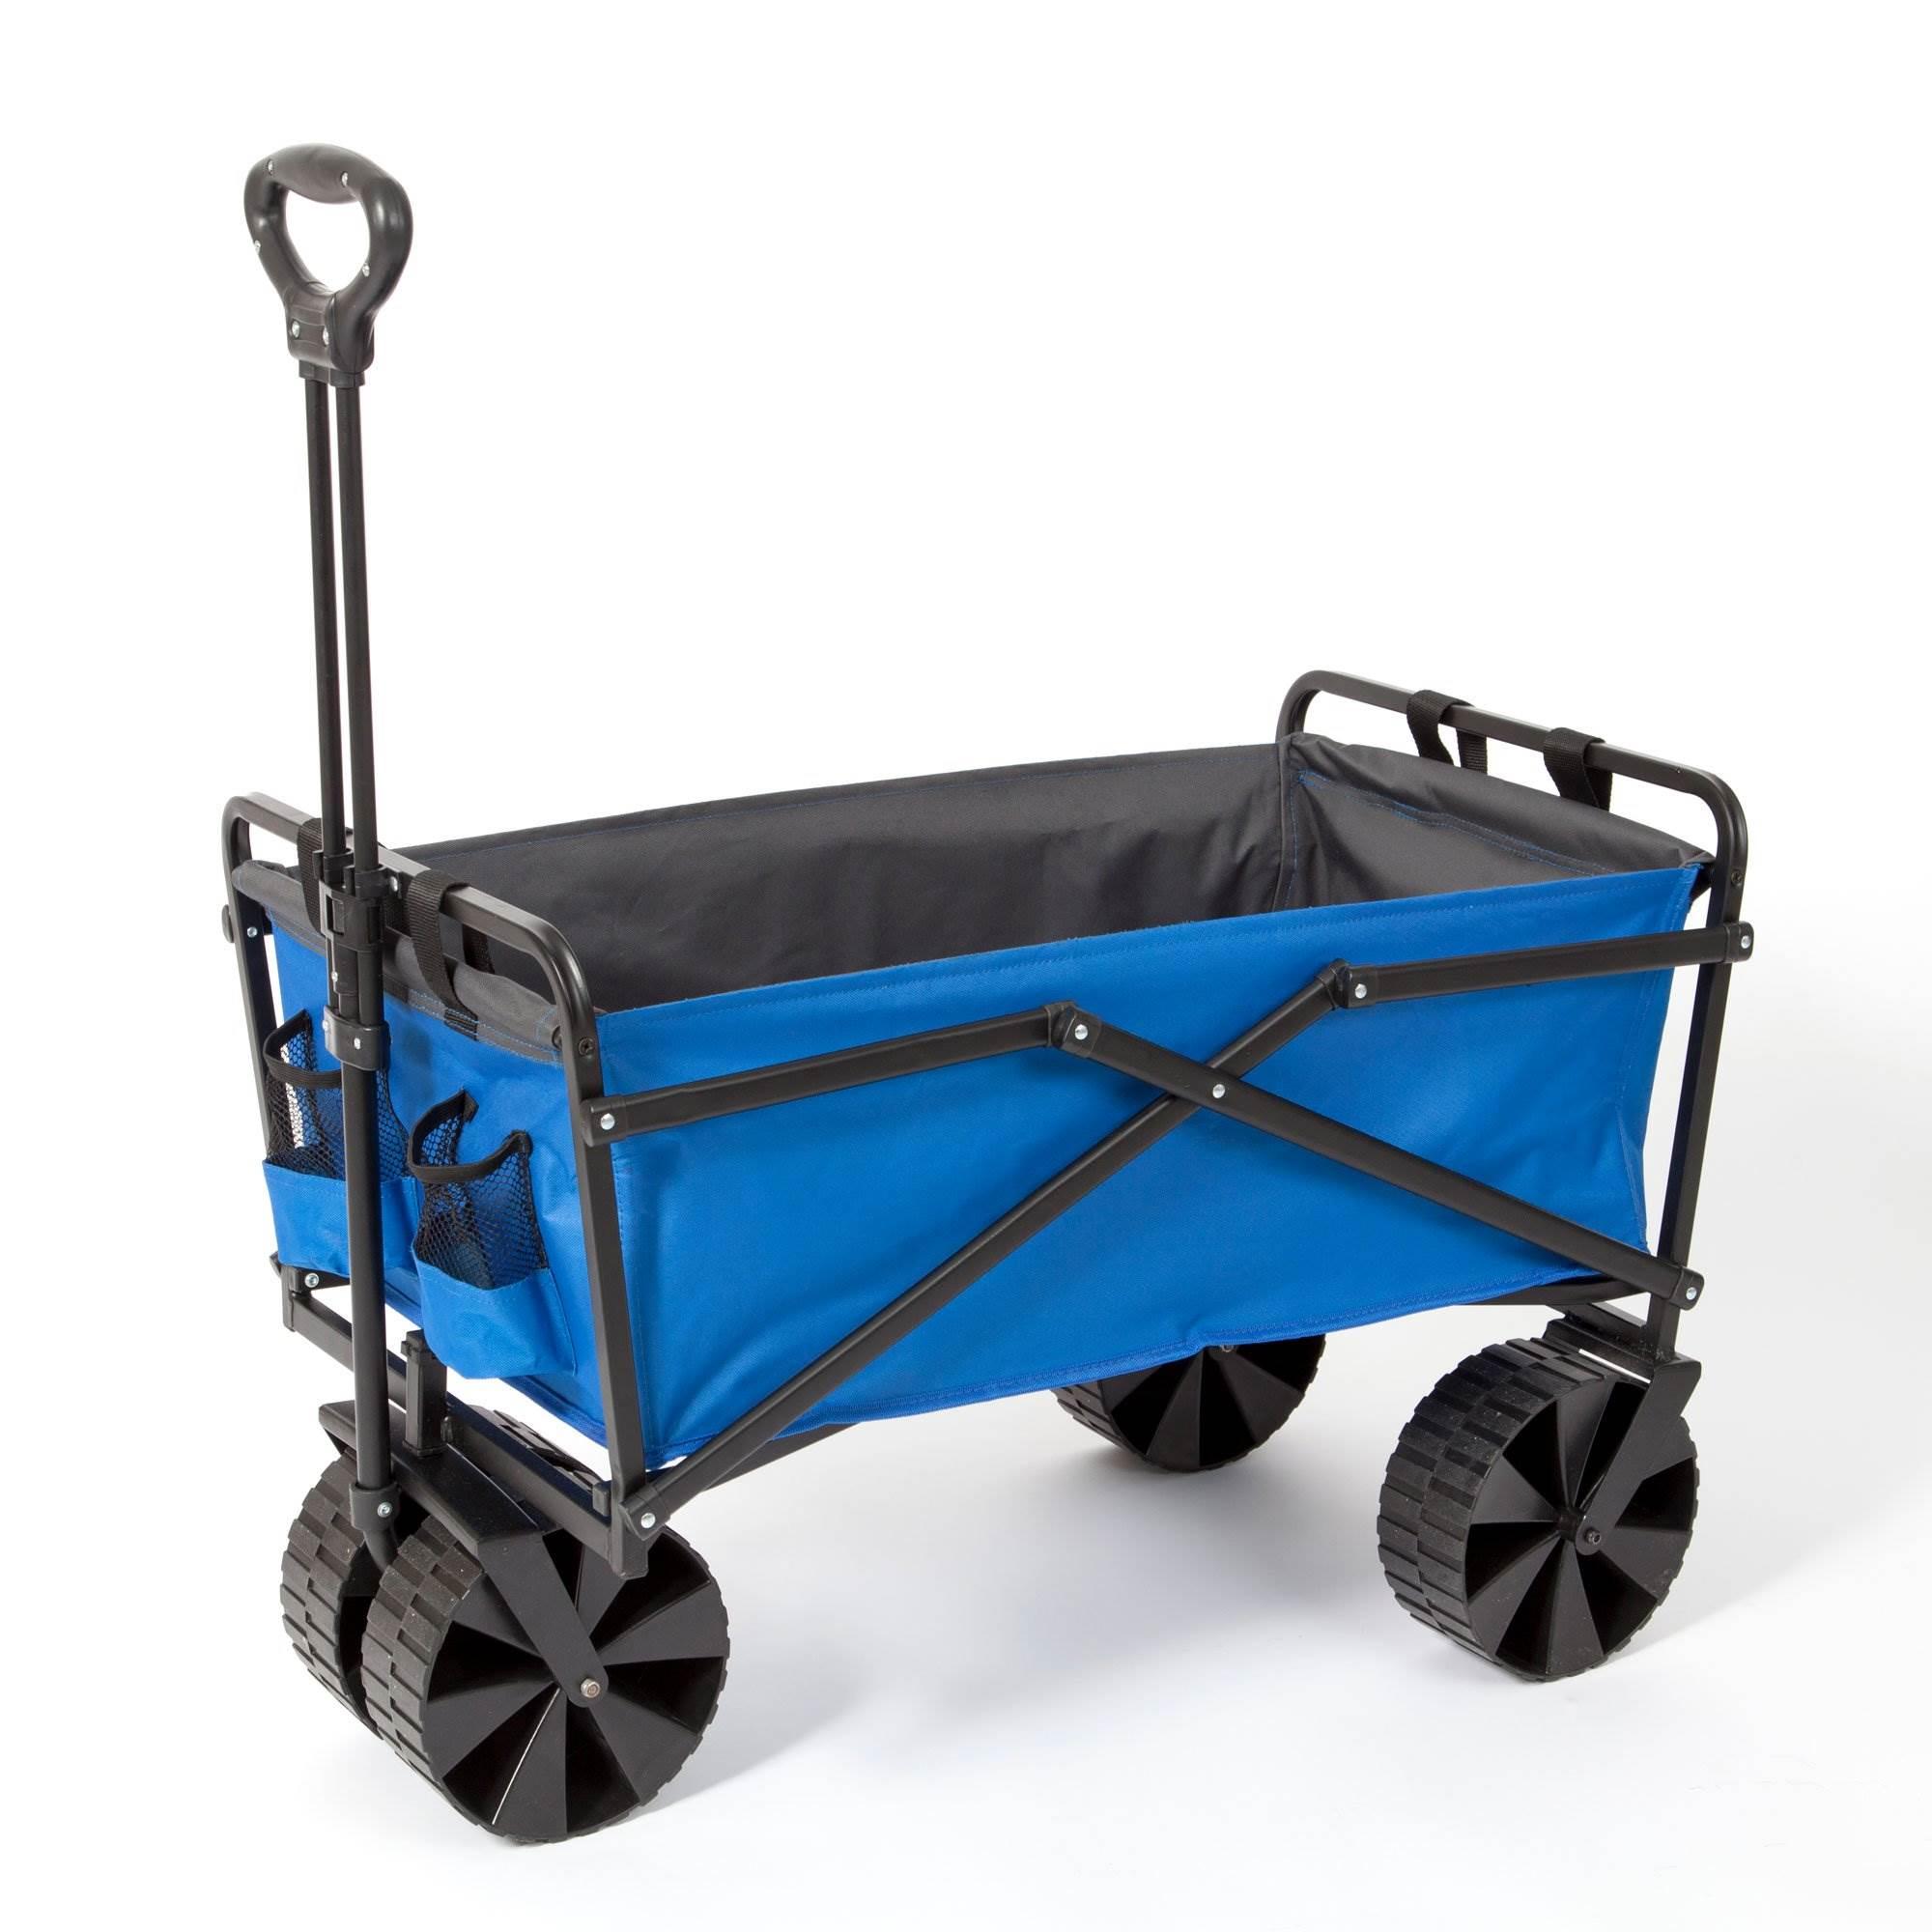 Seina Manual 150 Pound Steel Frame Folding Garden Cart Beach Wagon Blue Gray 859214007059 Ebay